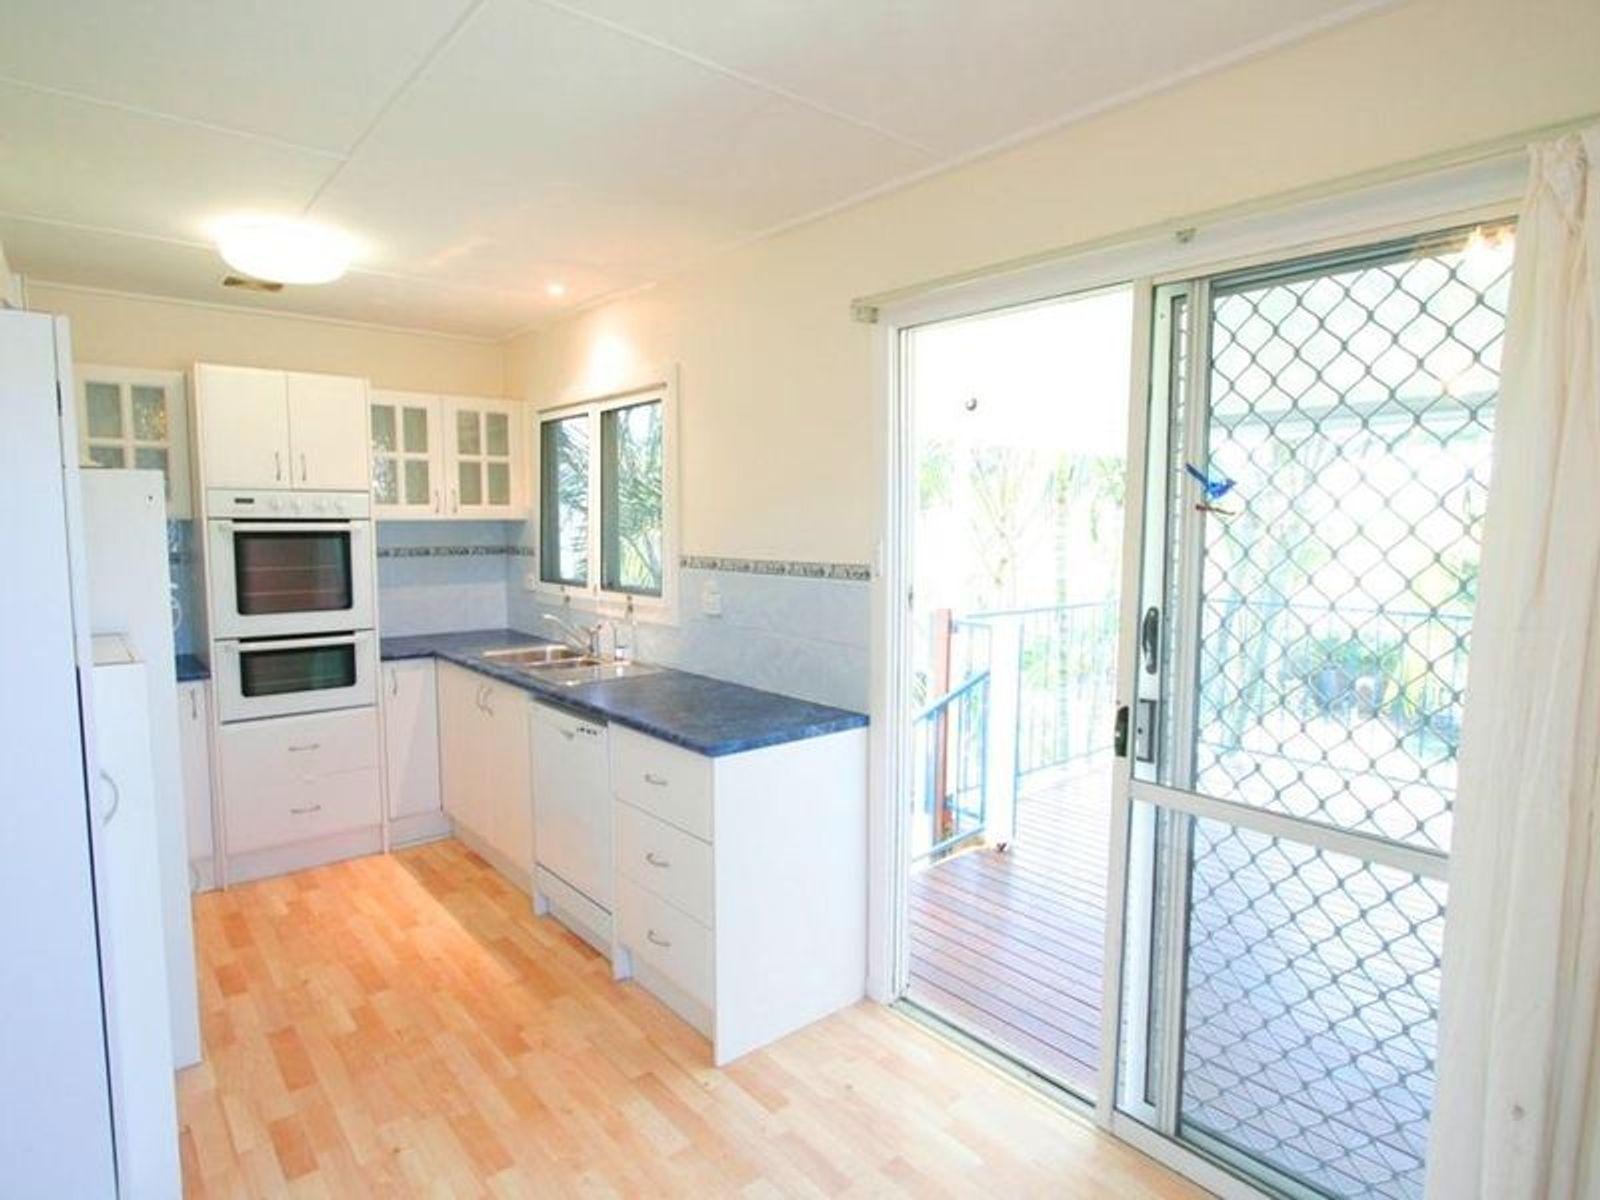 7 Jane Street, Southport, QLD 4215